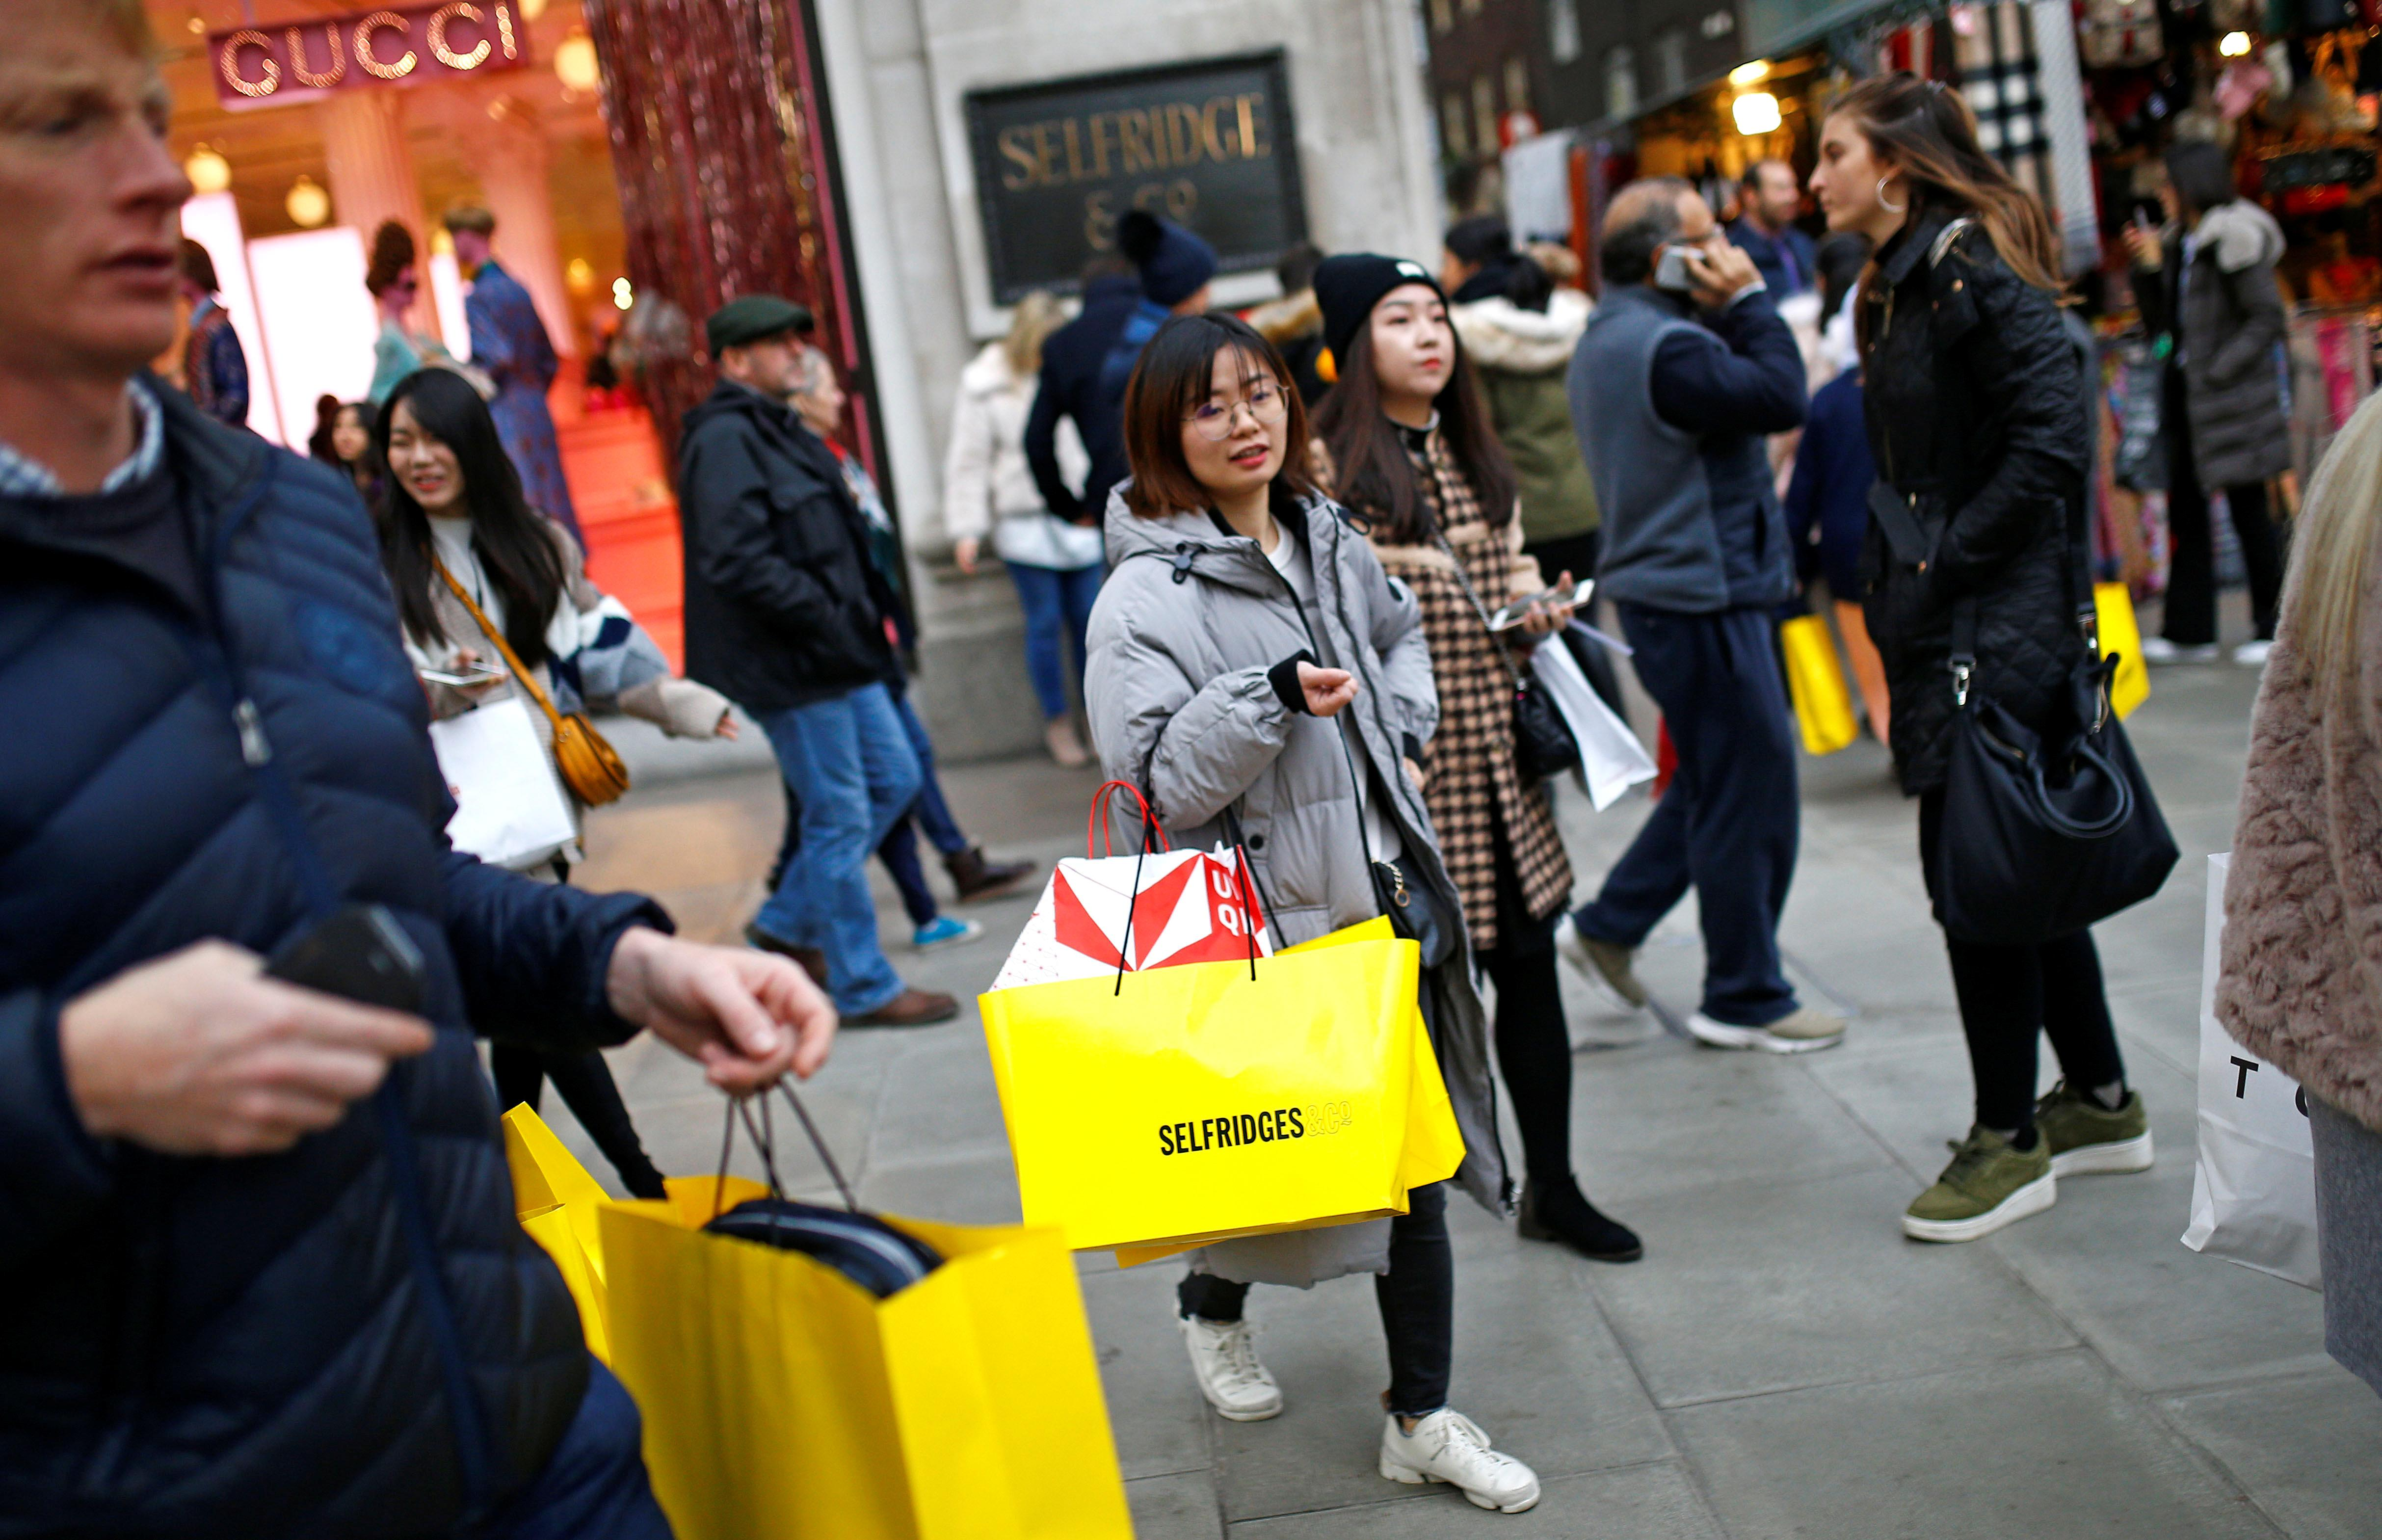 CBI: Retail sales plummeting at fastest pace since 2008